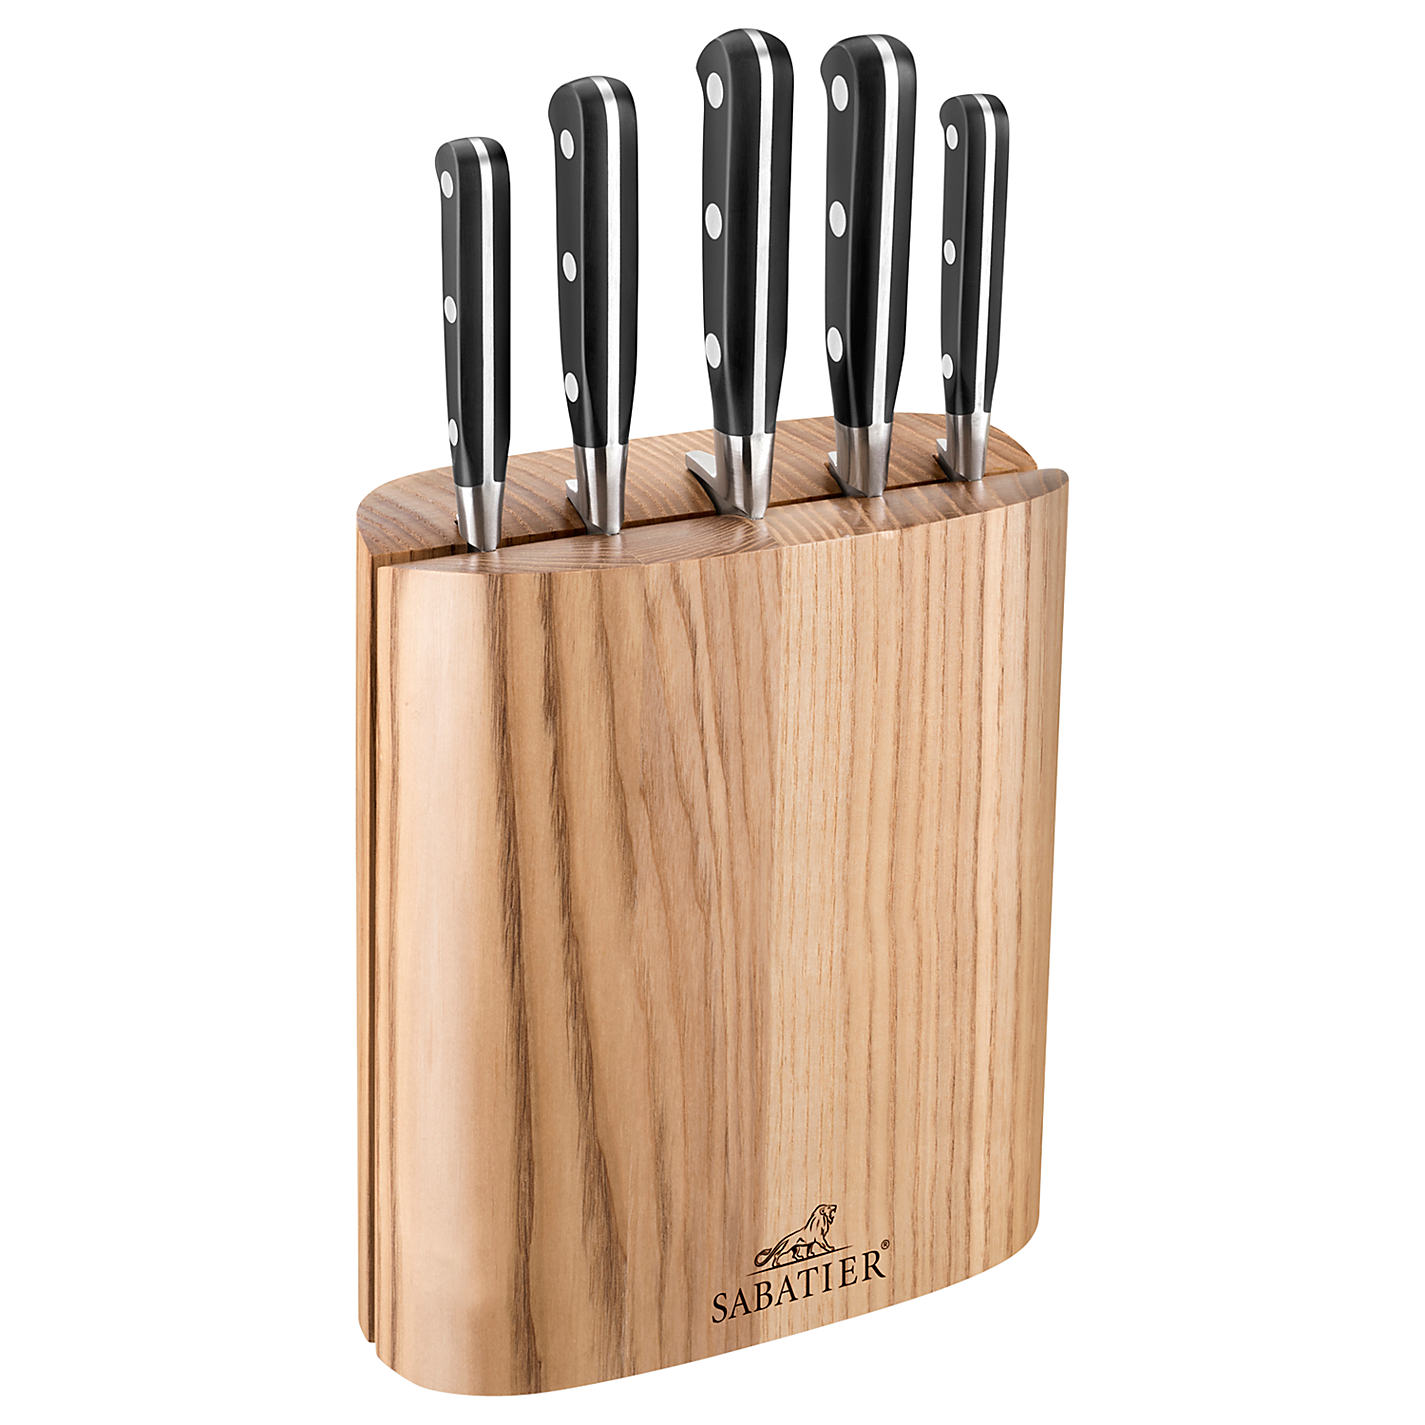 knife blocks john lewis buy sabatier filled knife block 5 piece online at johnlewis com